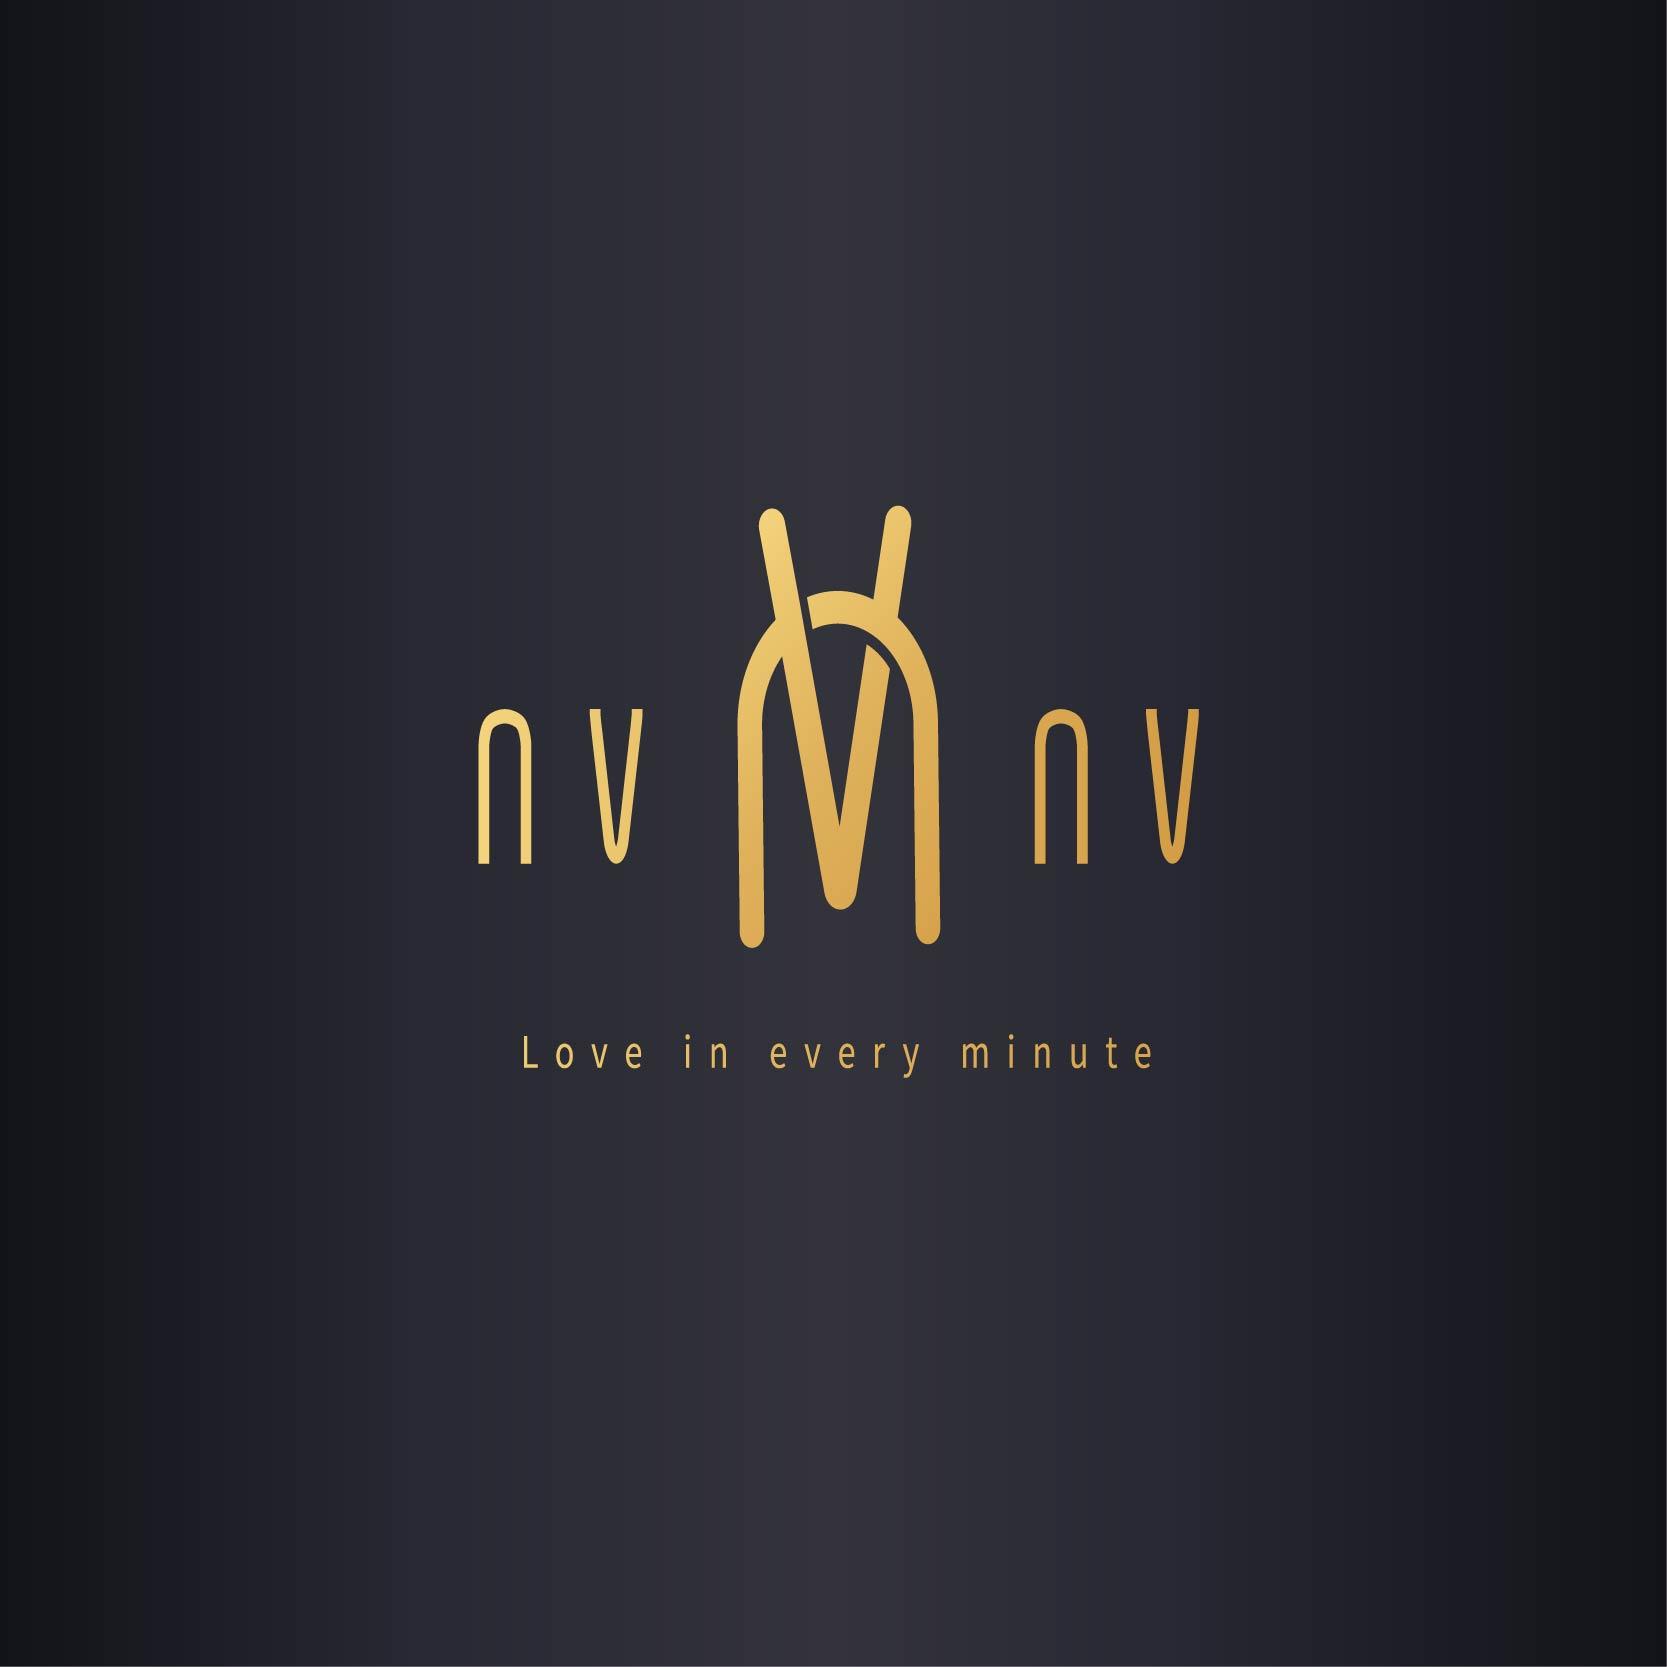 NVNV轻塑内衣品牌LOGO设计